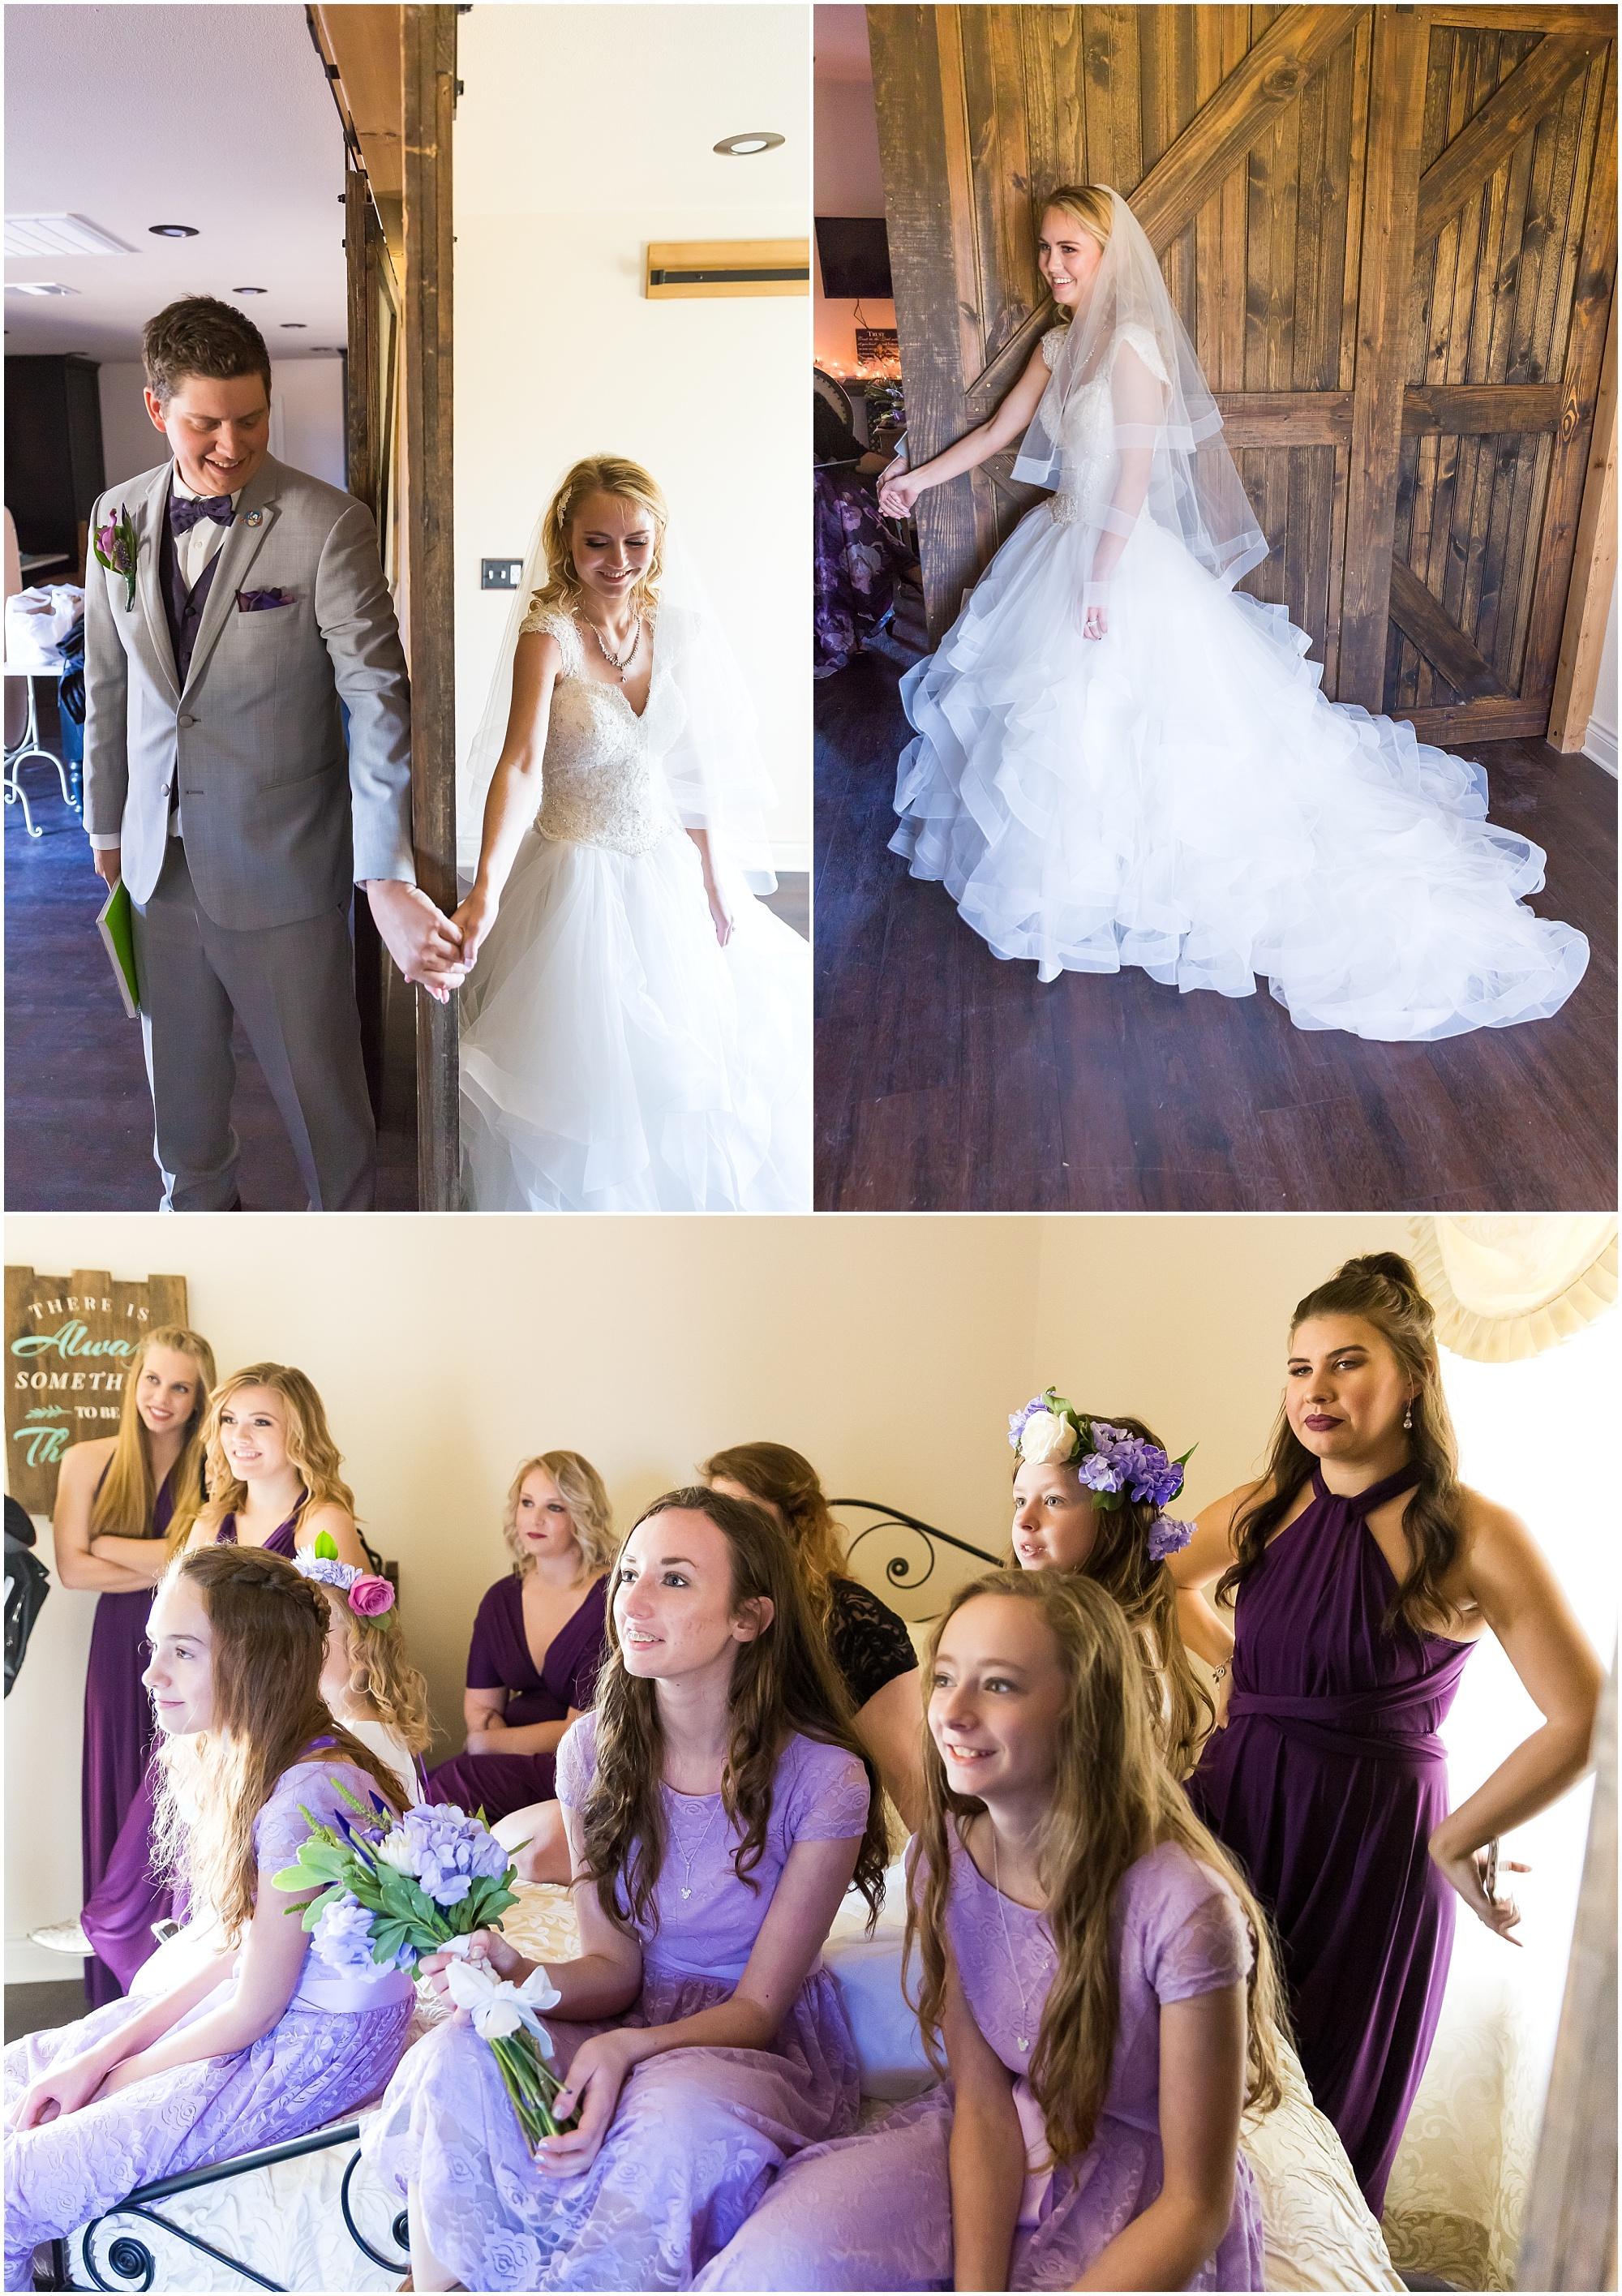 Disney-Inspired-Wedding-Central-Texas_0027.jpg